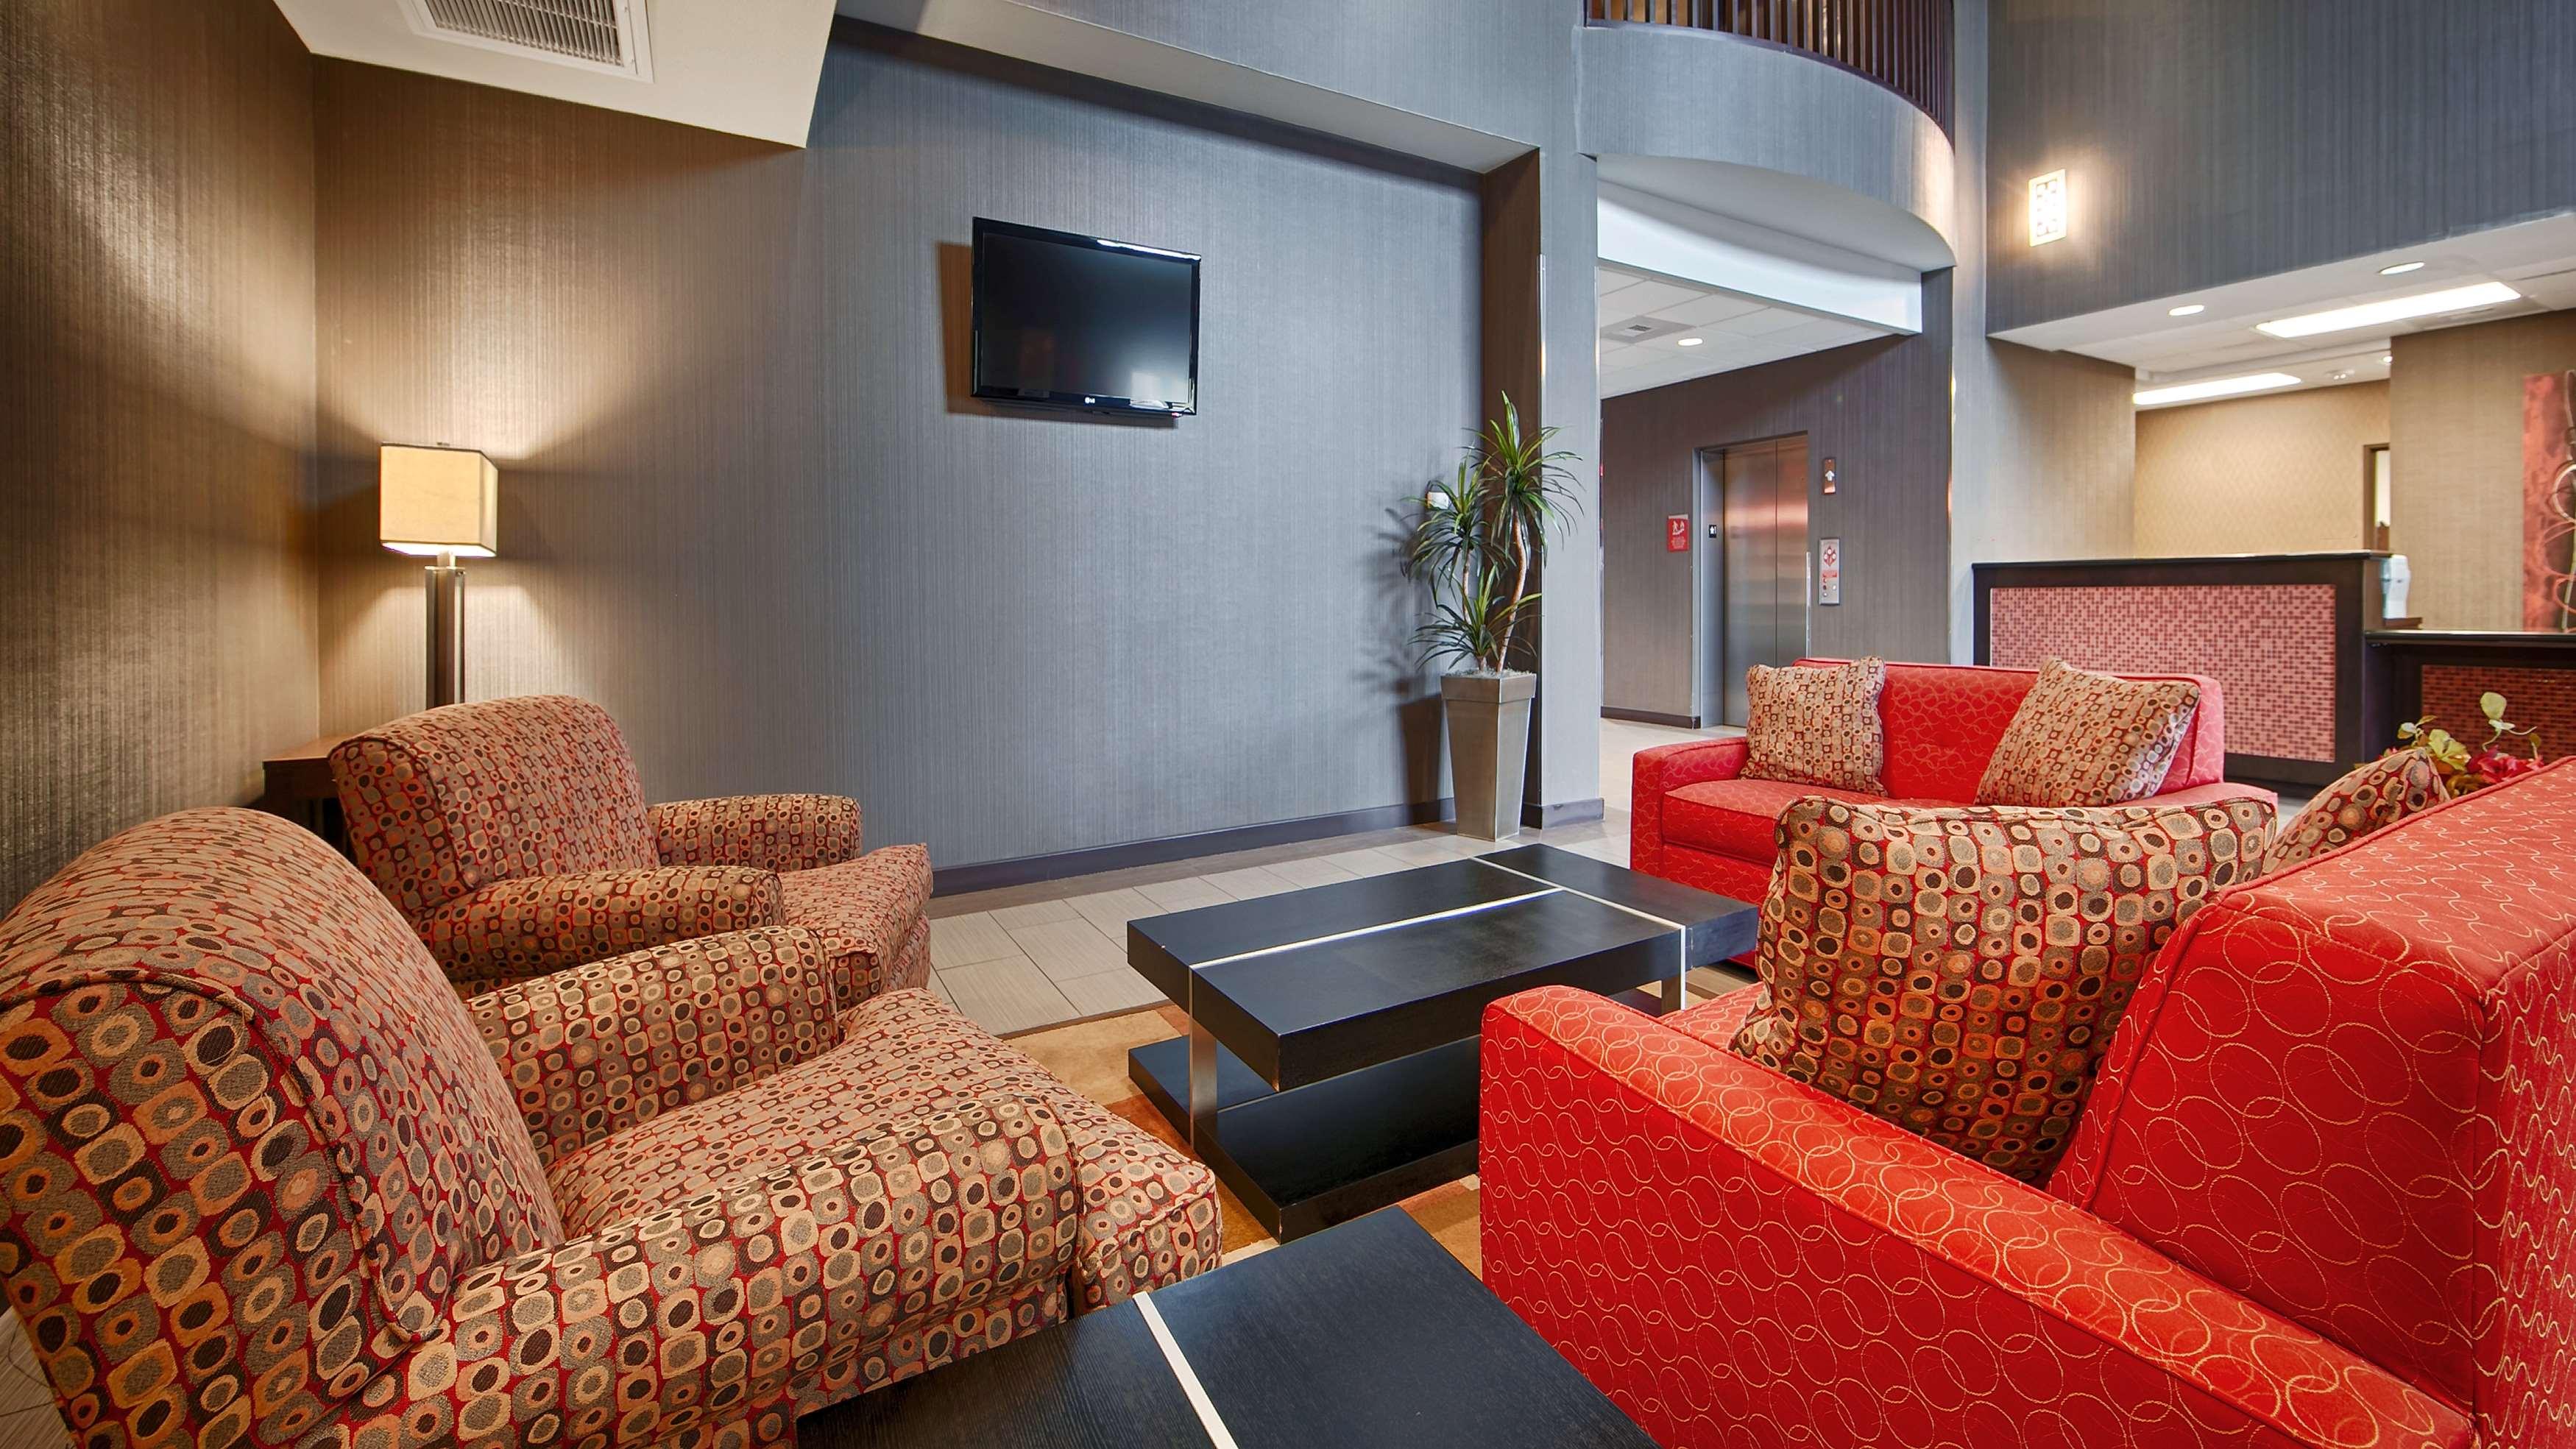 Best Western Plus Austin Airport Inn & Suites image 2